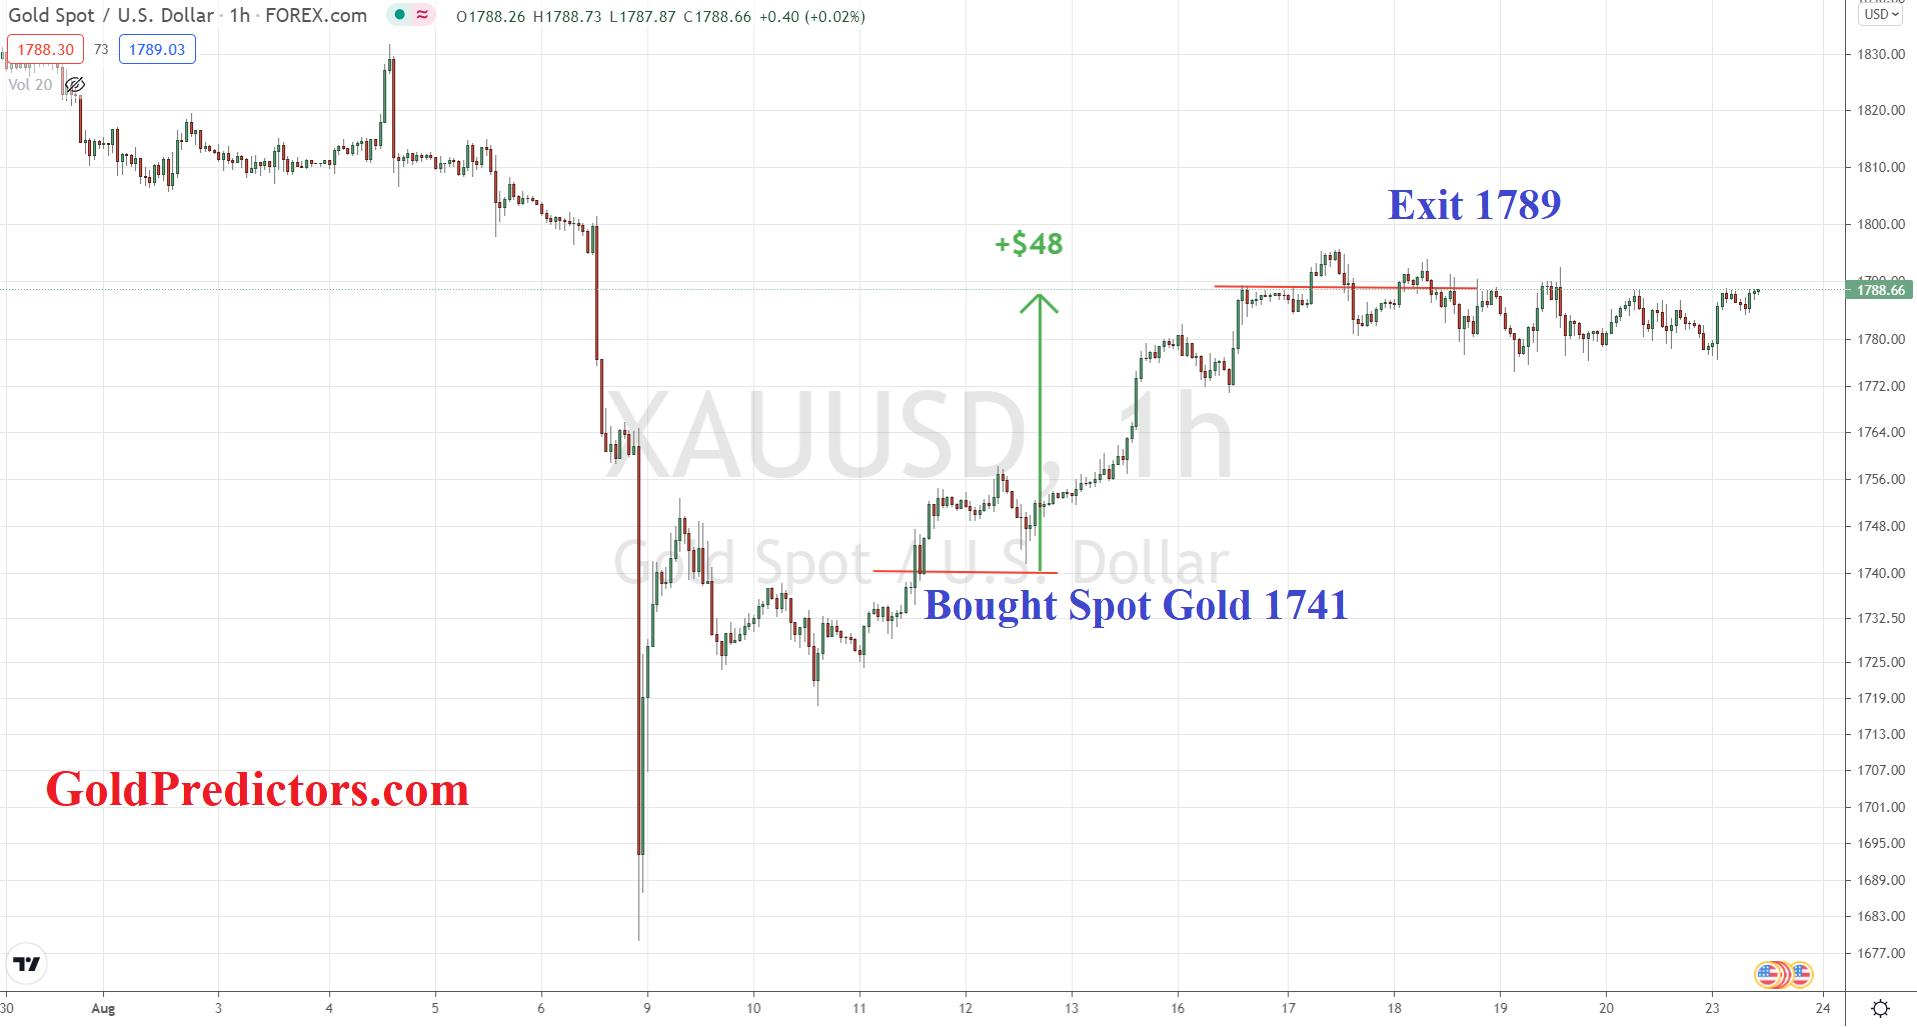 Gold Behavior